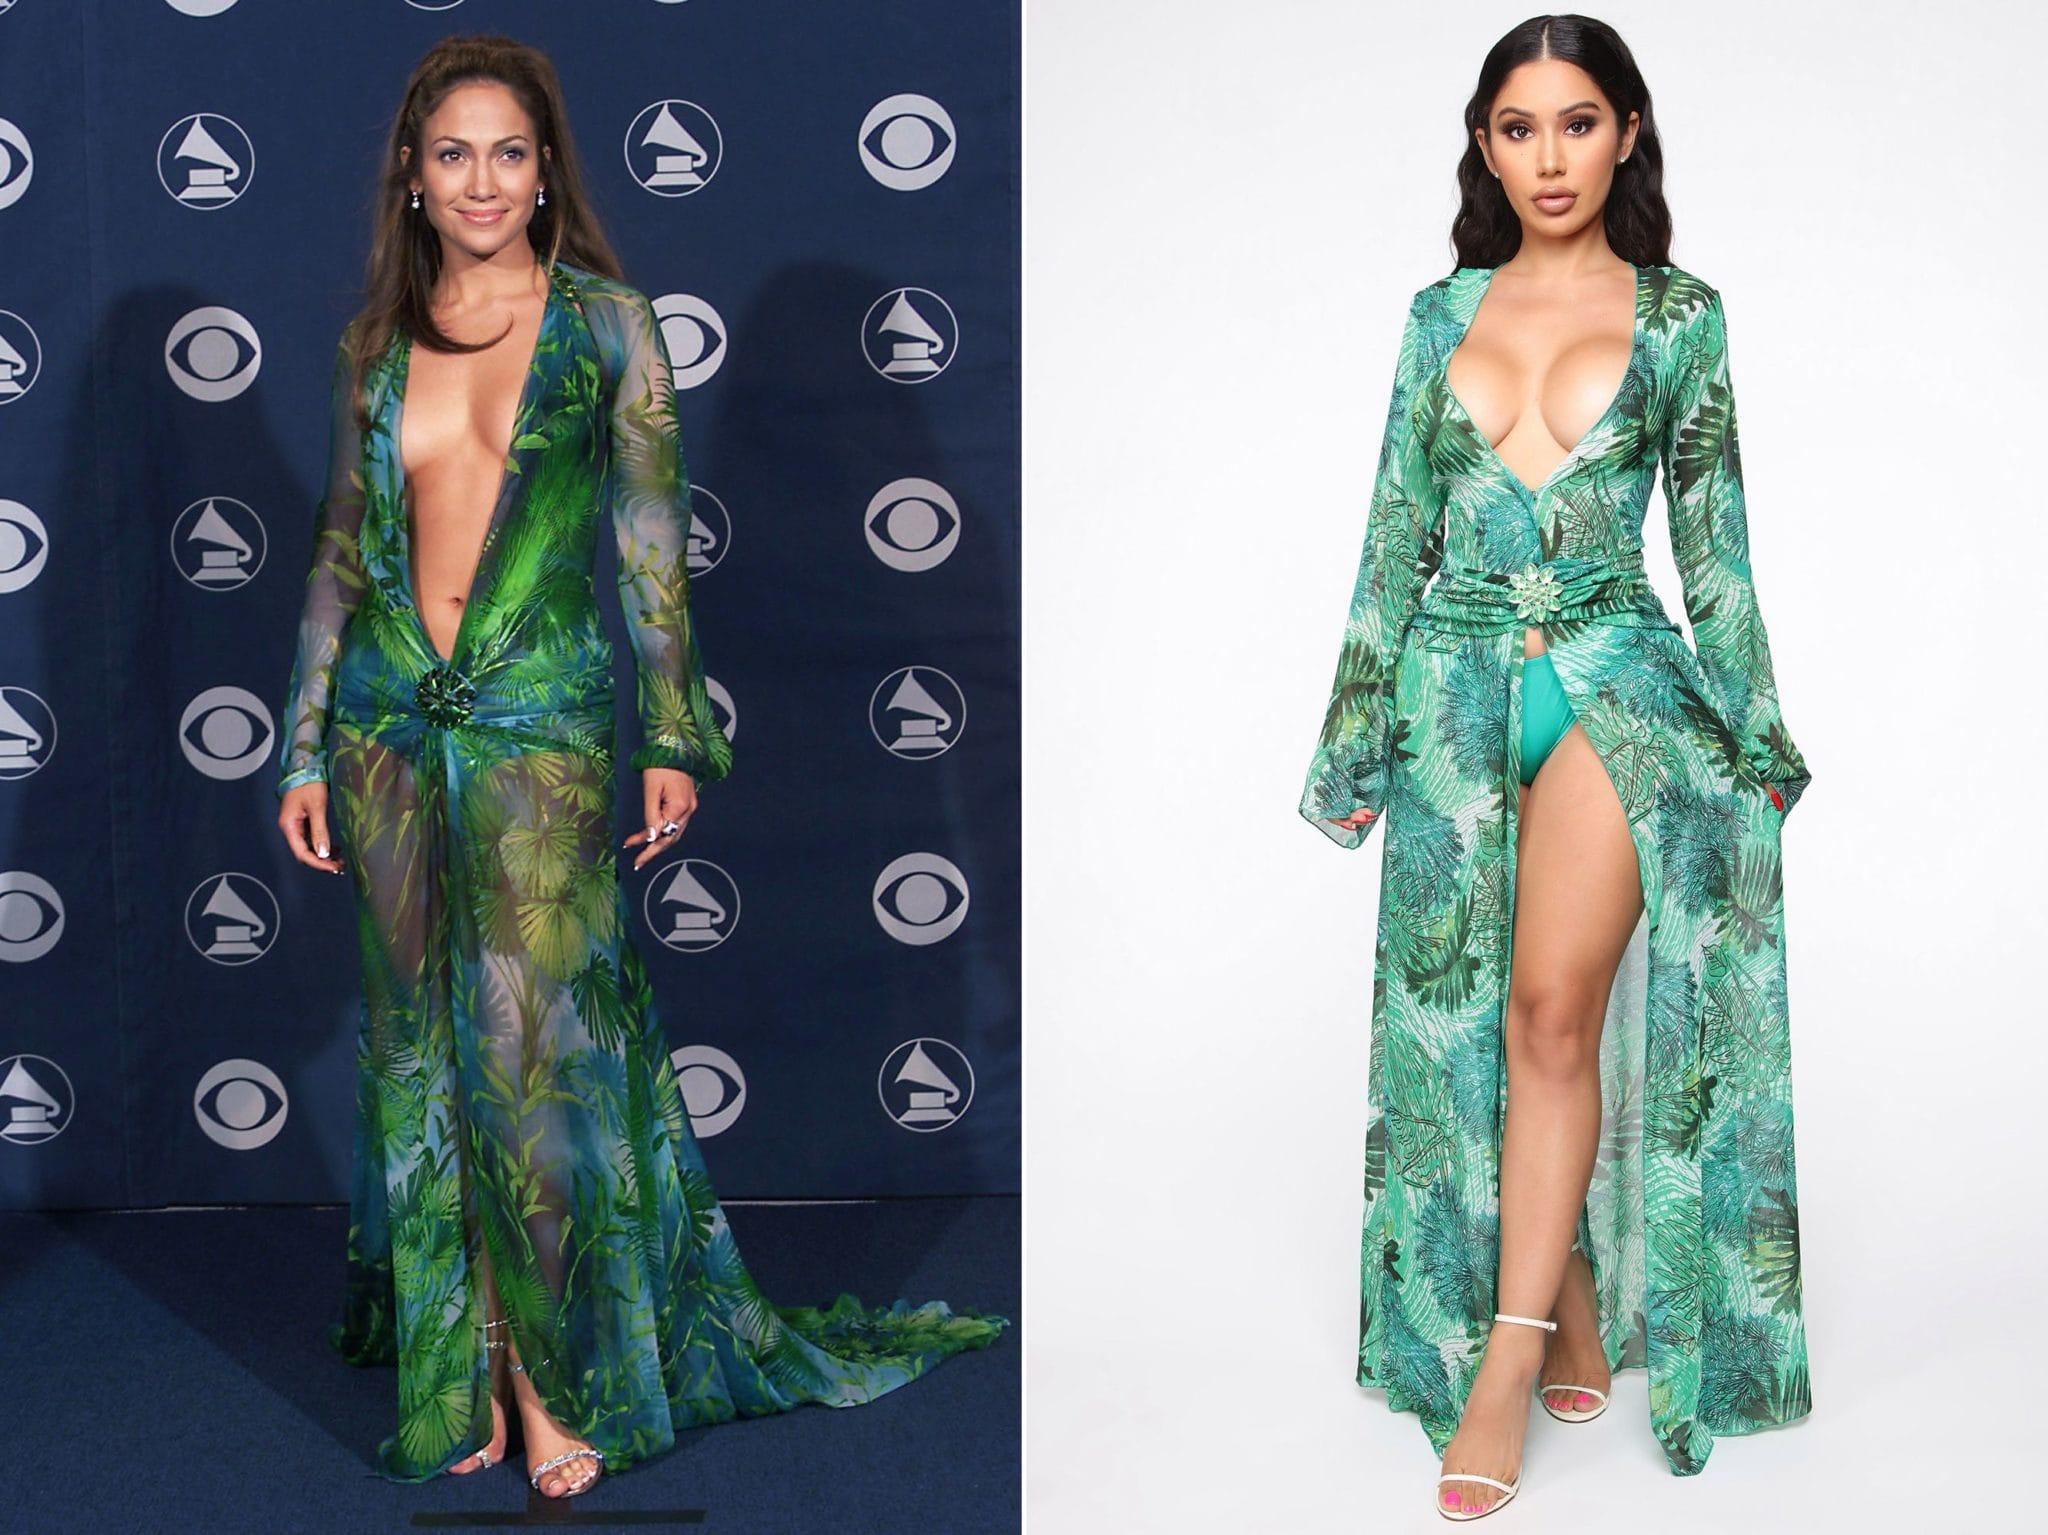 versace vs fashion nova scaled